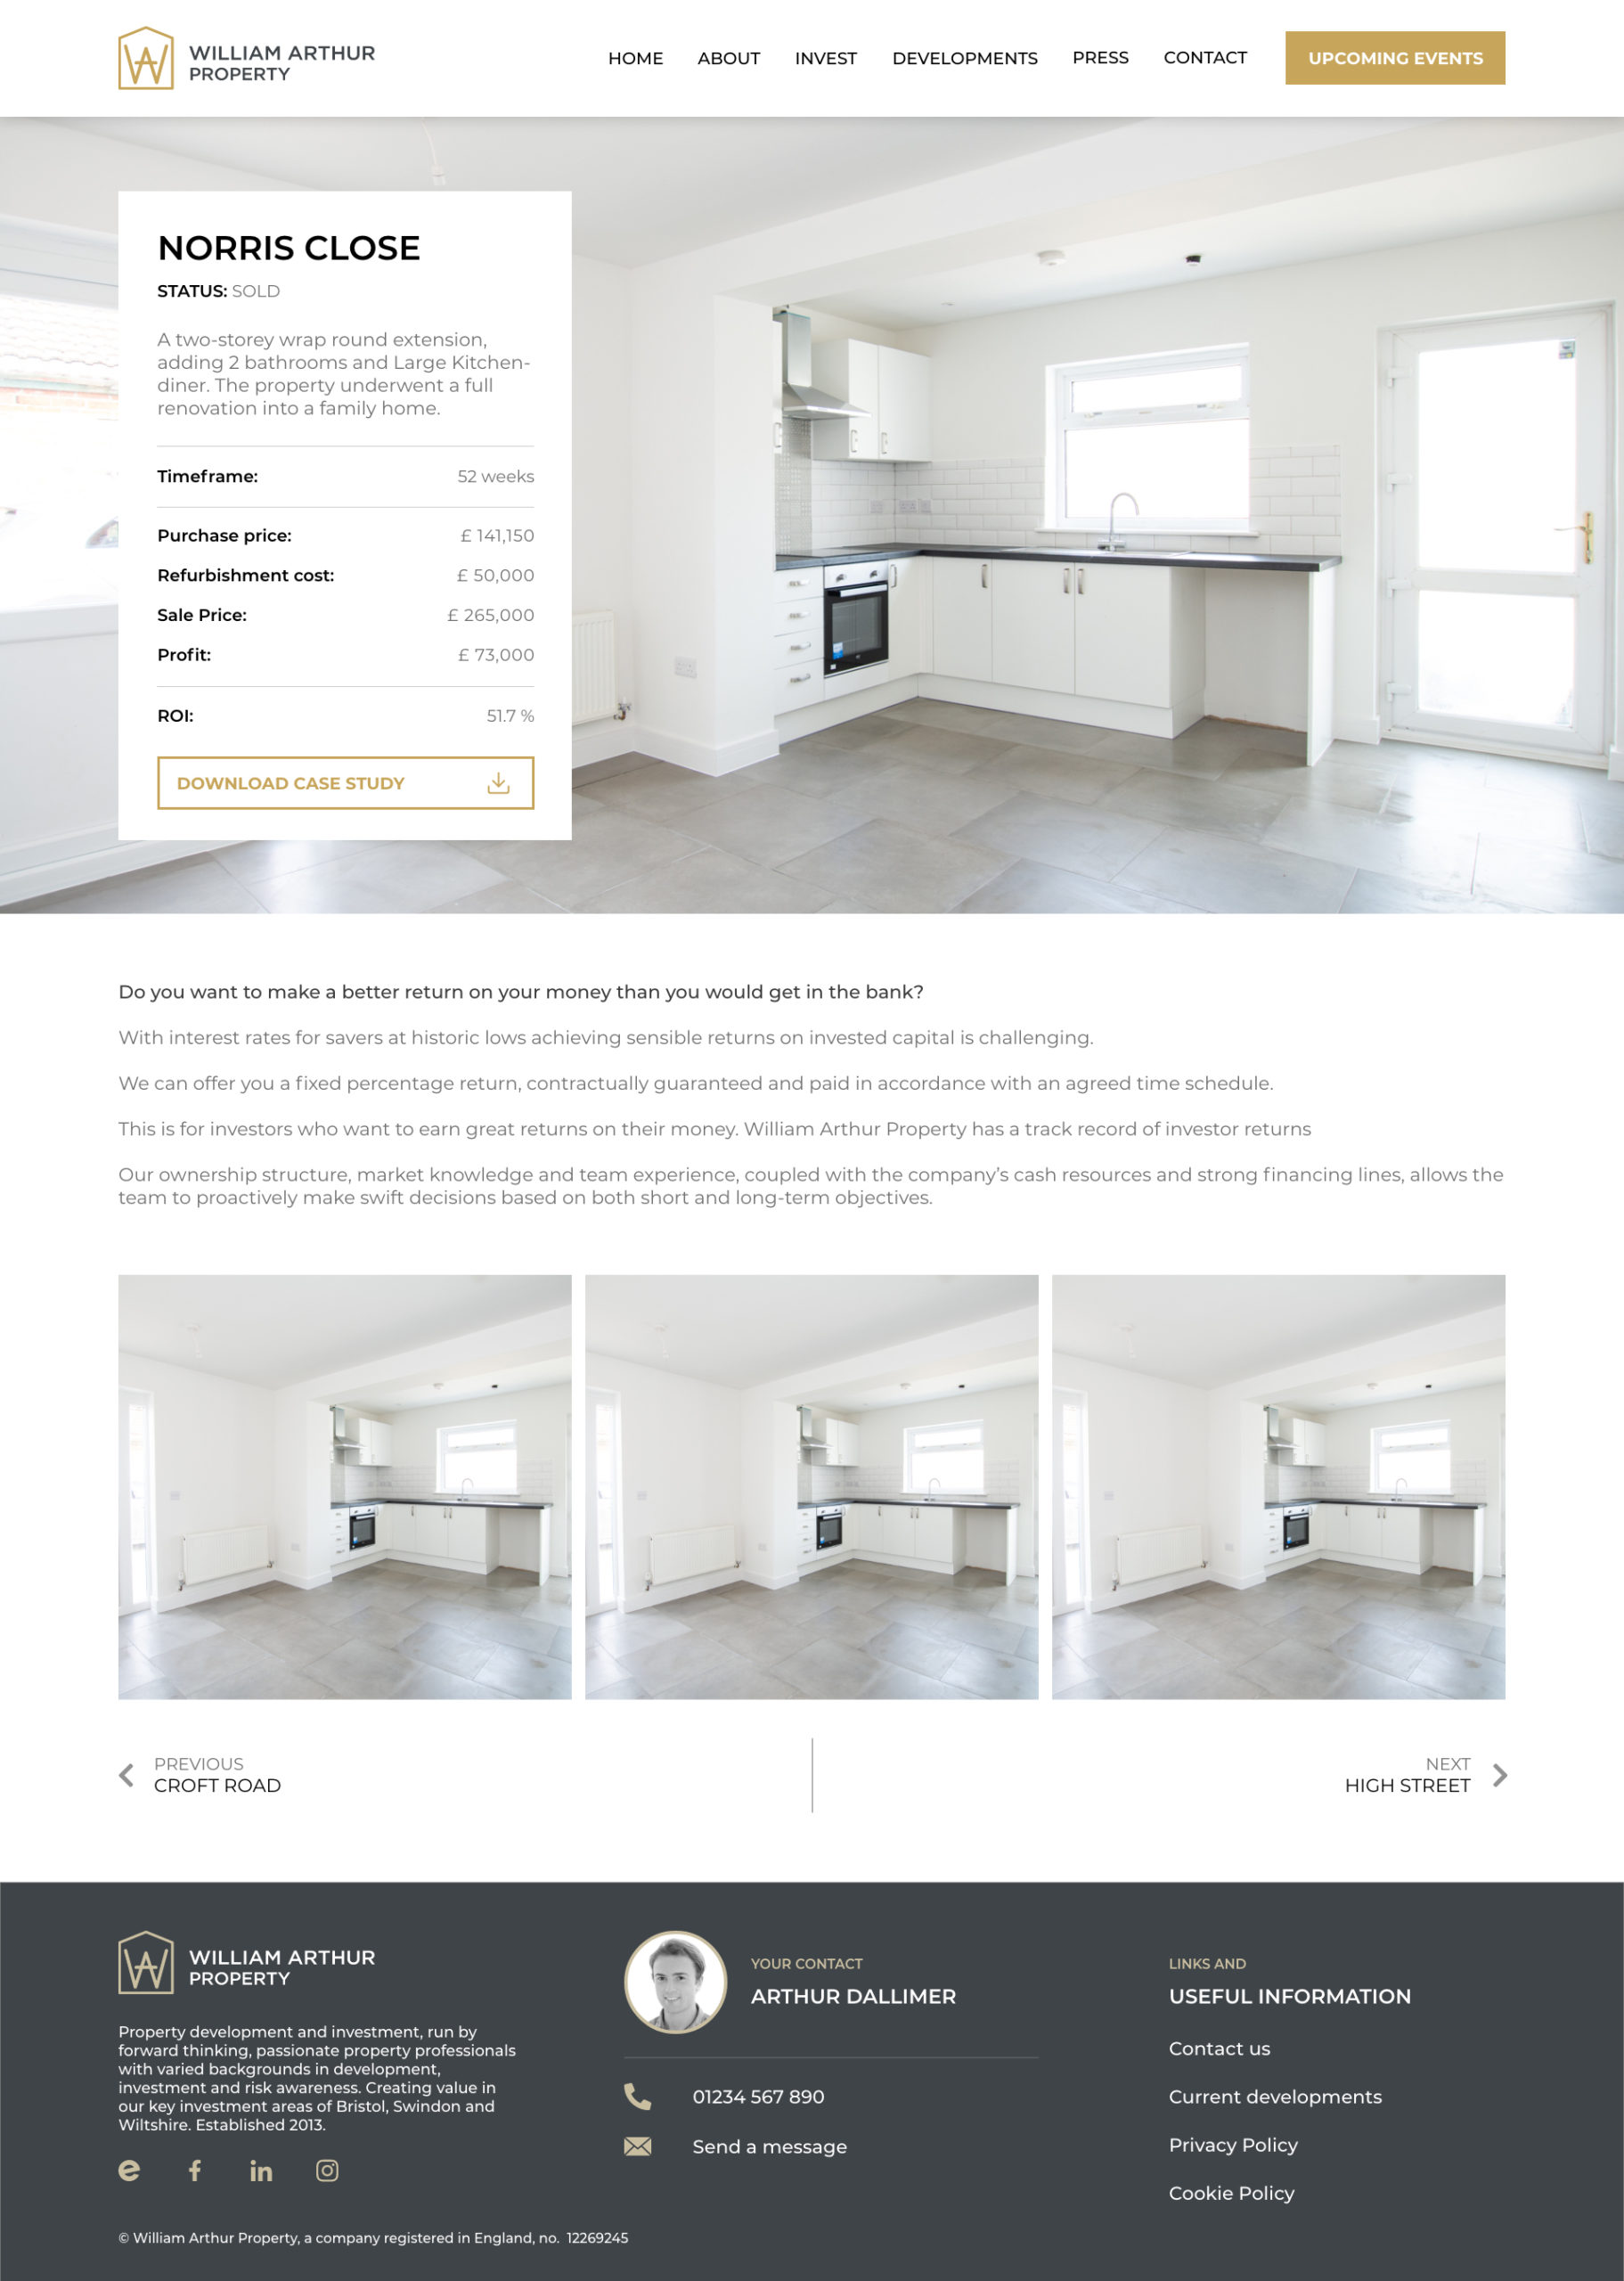 William Arthur - D121 - Property - Success